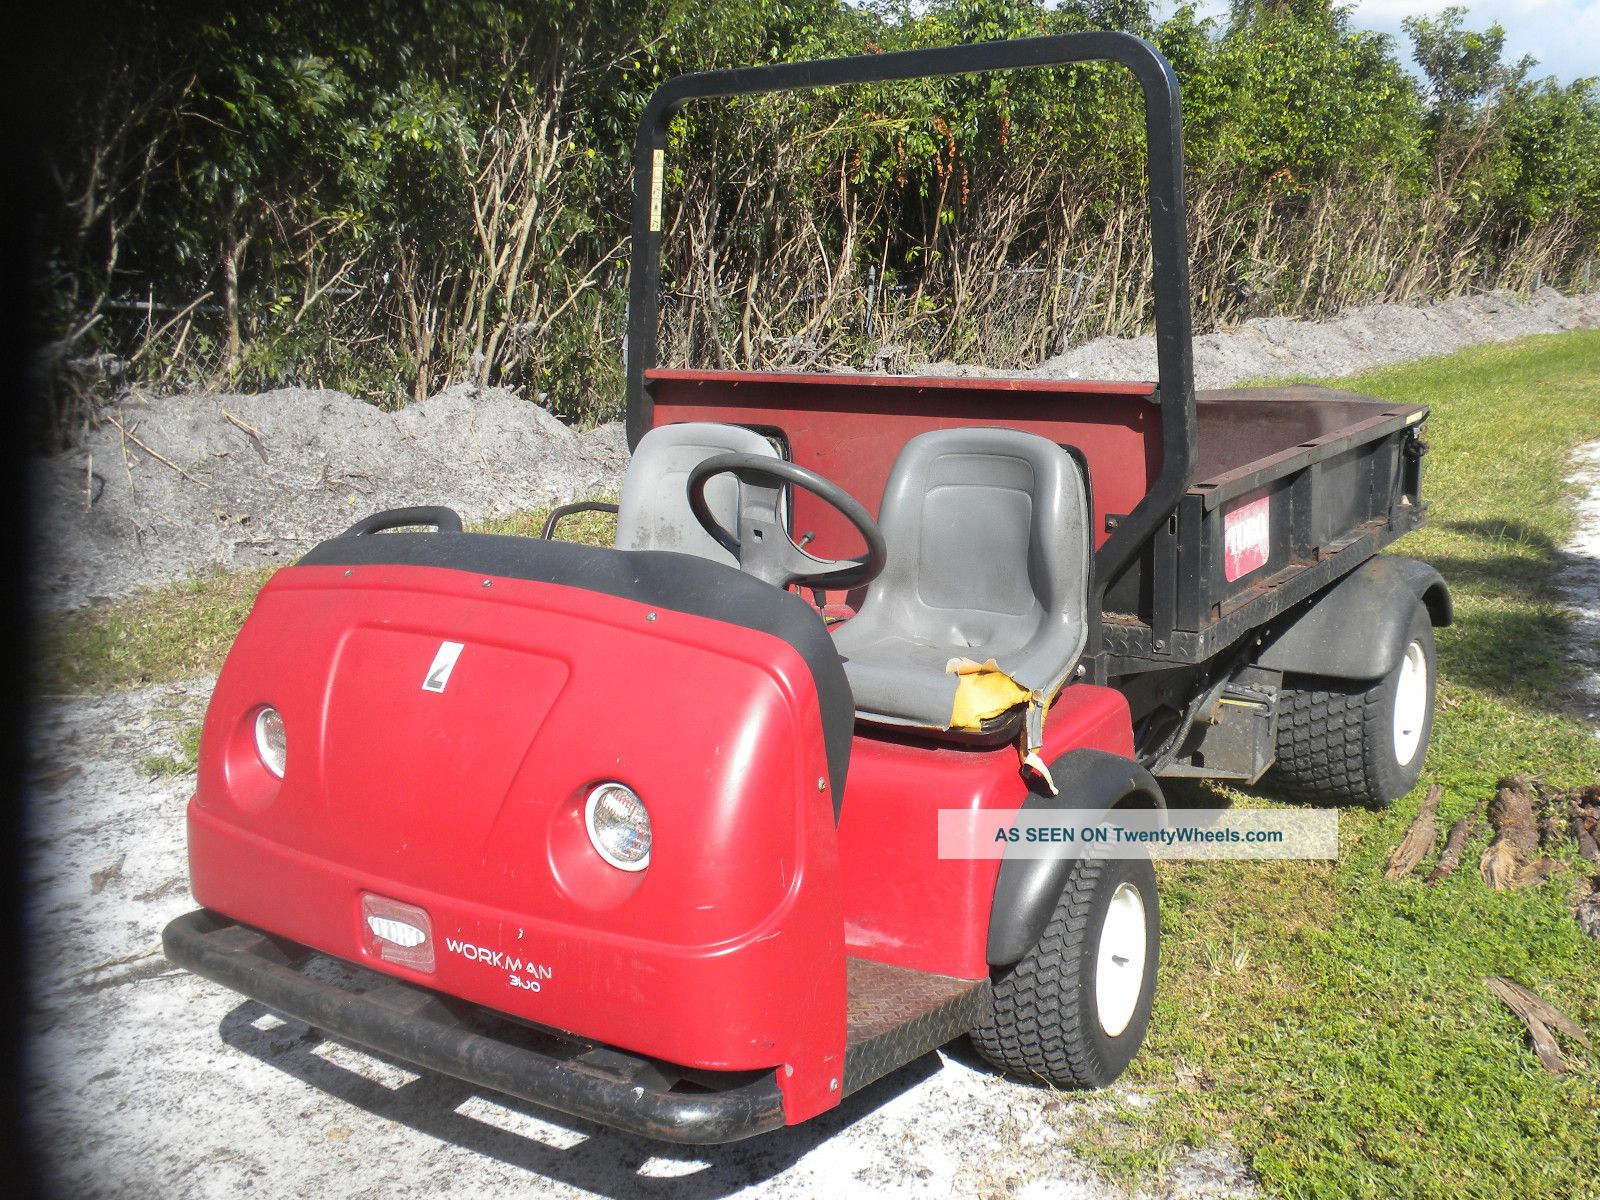 Toro Workman 3100 Utility Vehicles photo